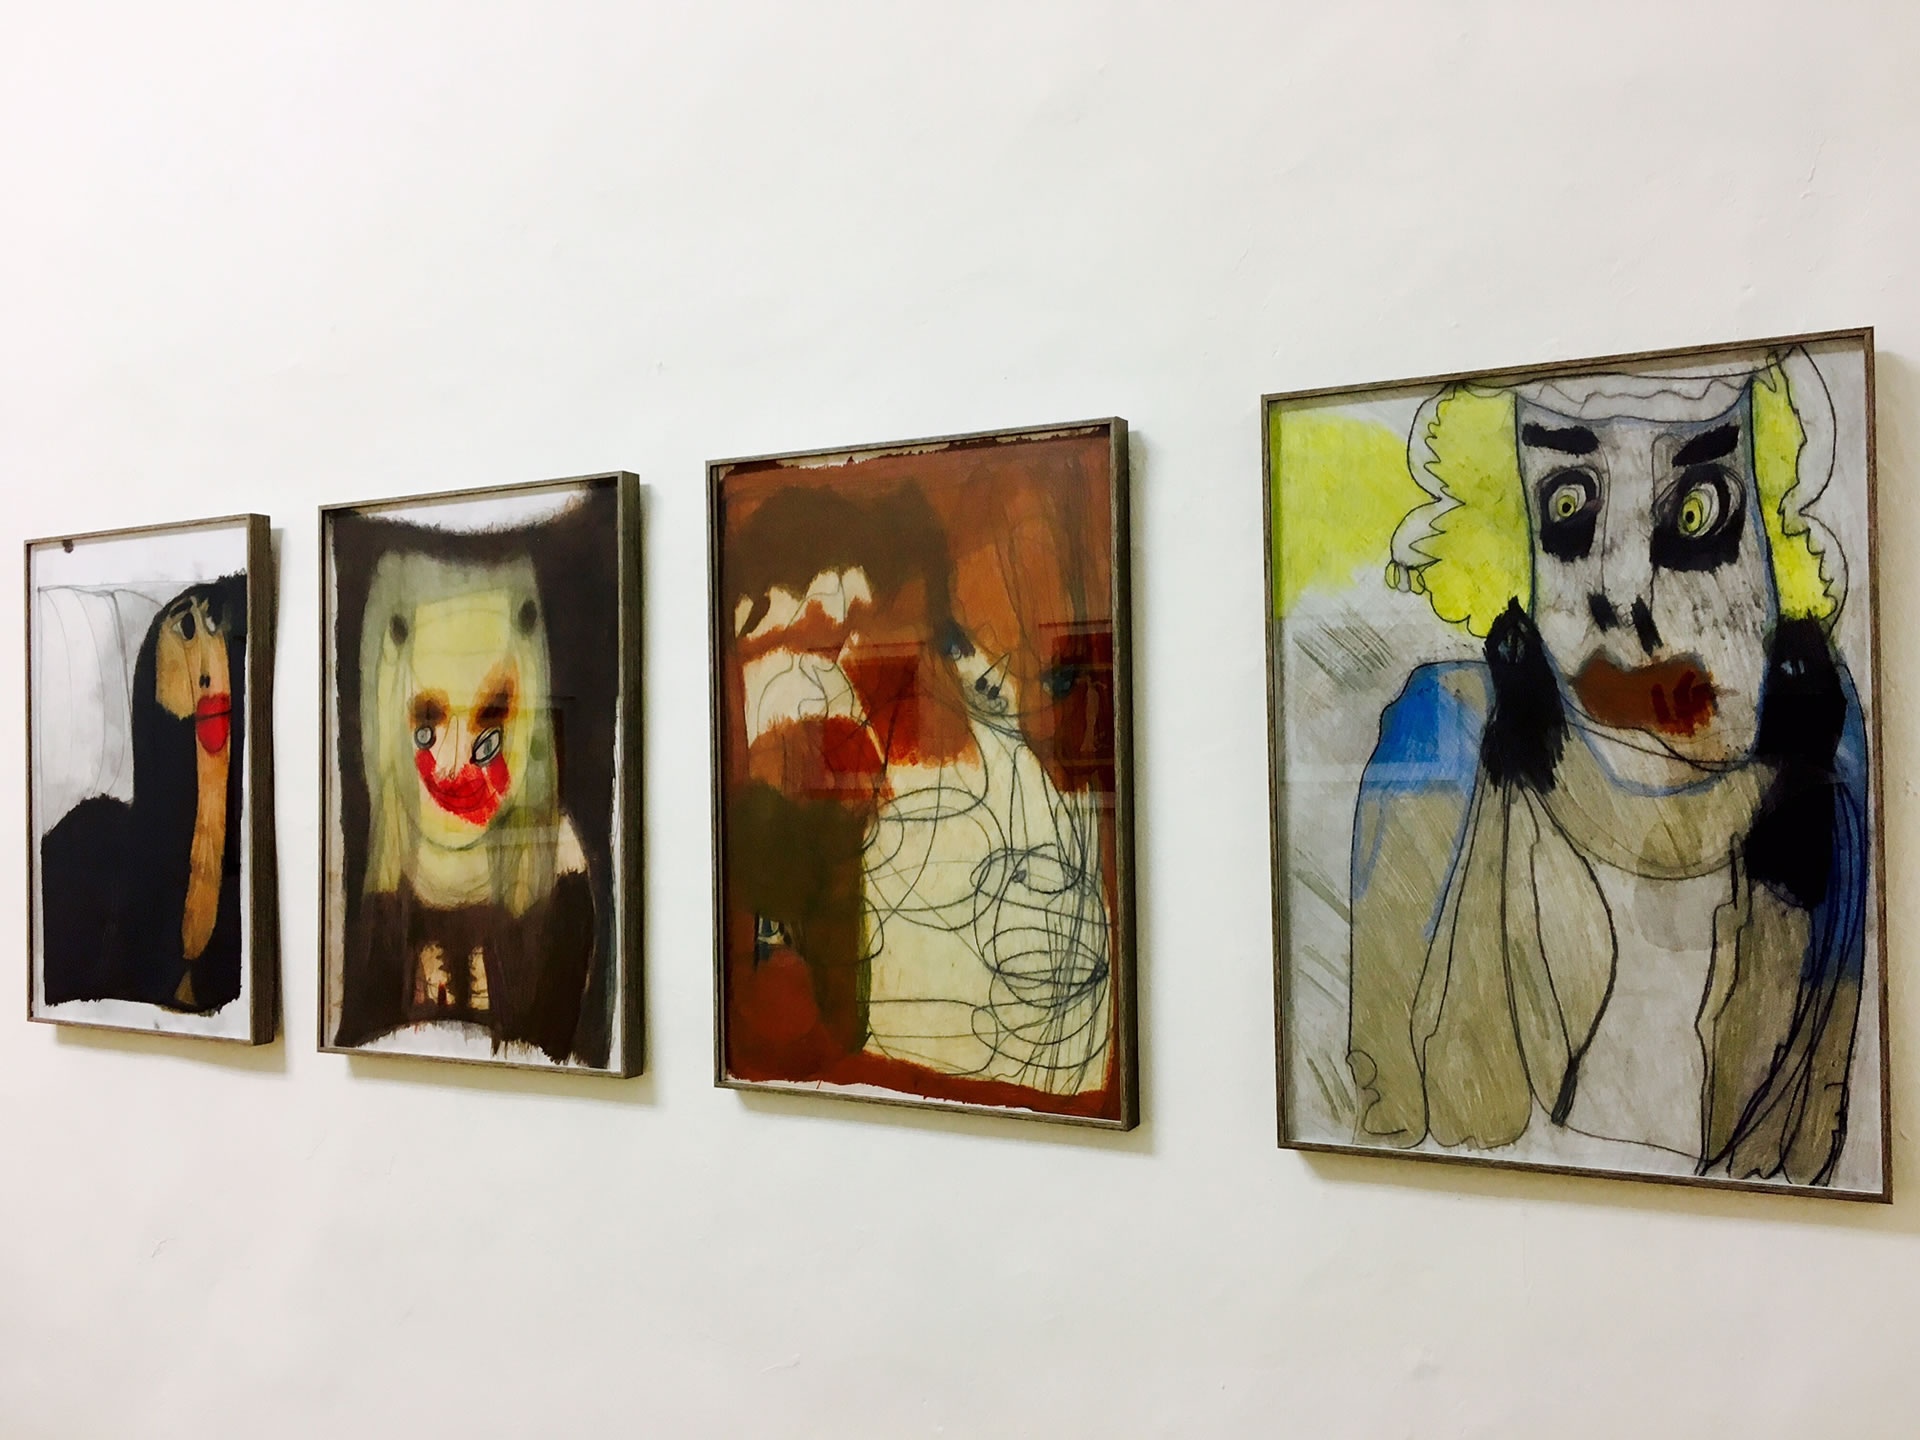 Galerie3 | Kopfkino | 17 | Sylvia Manfreda